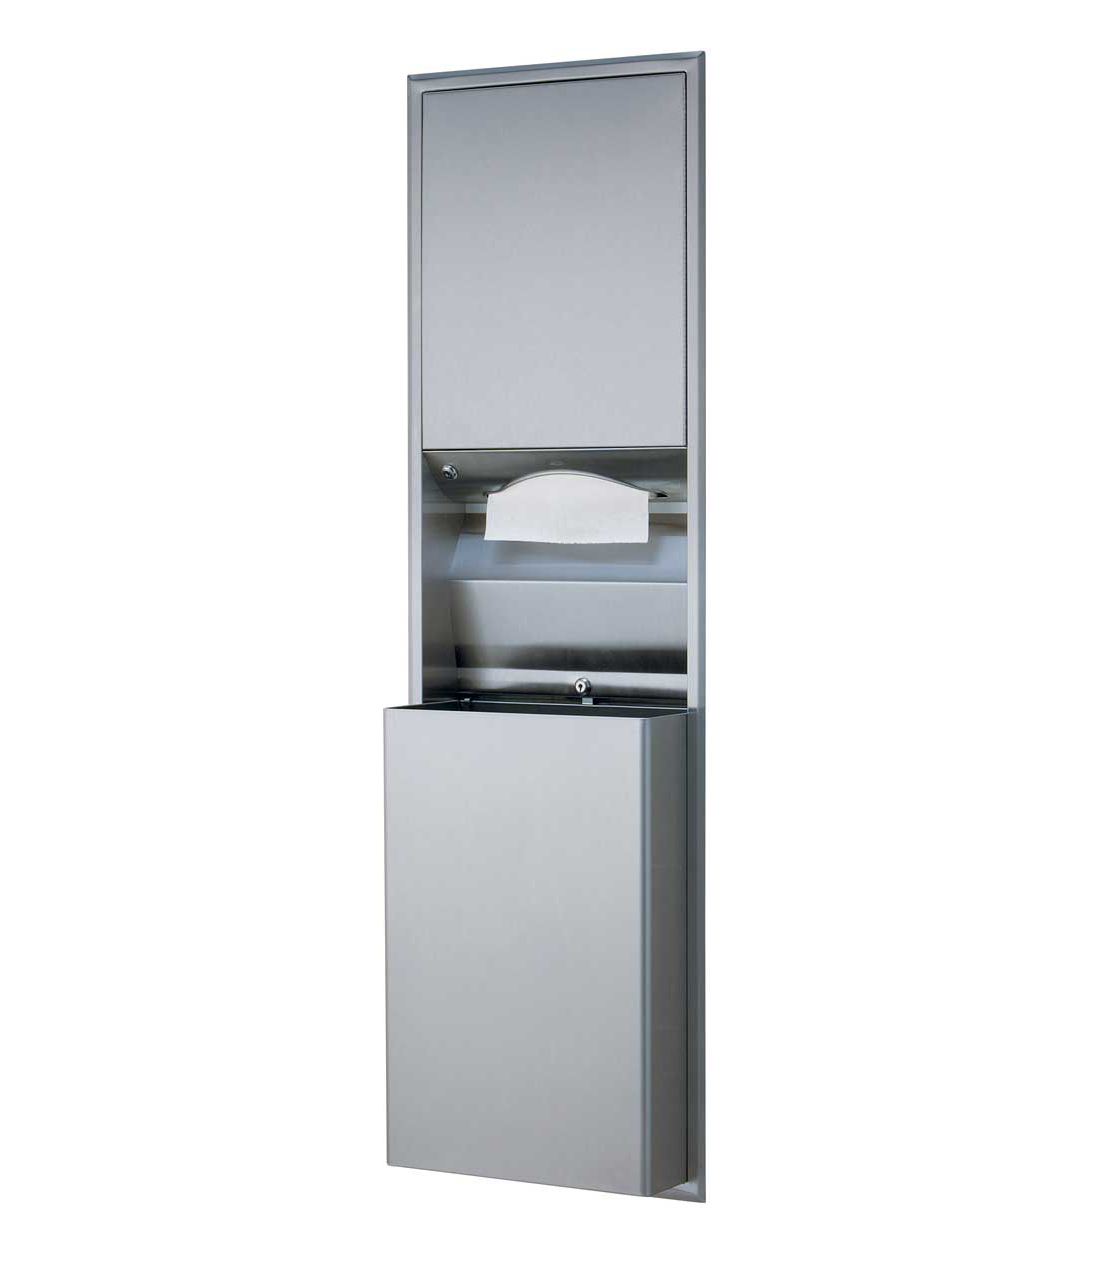 Bobrick Classic Series Recessed Paper Towel Dispenser